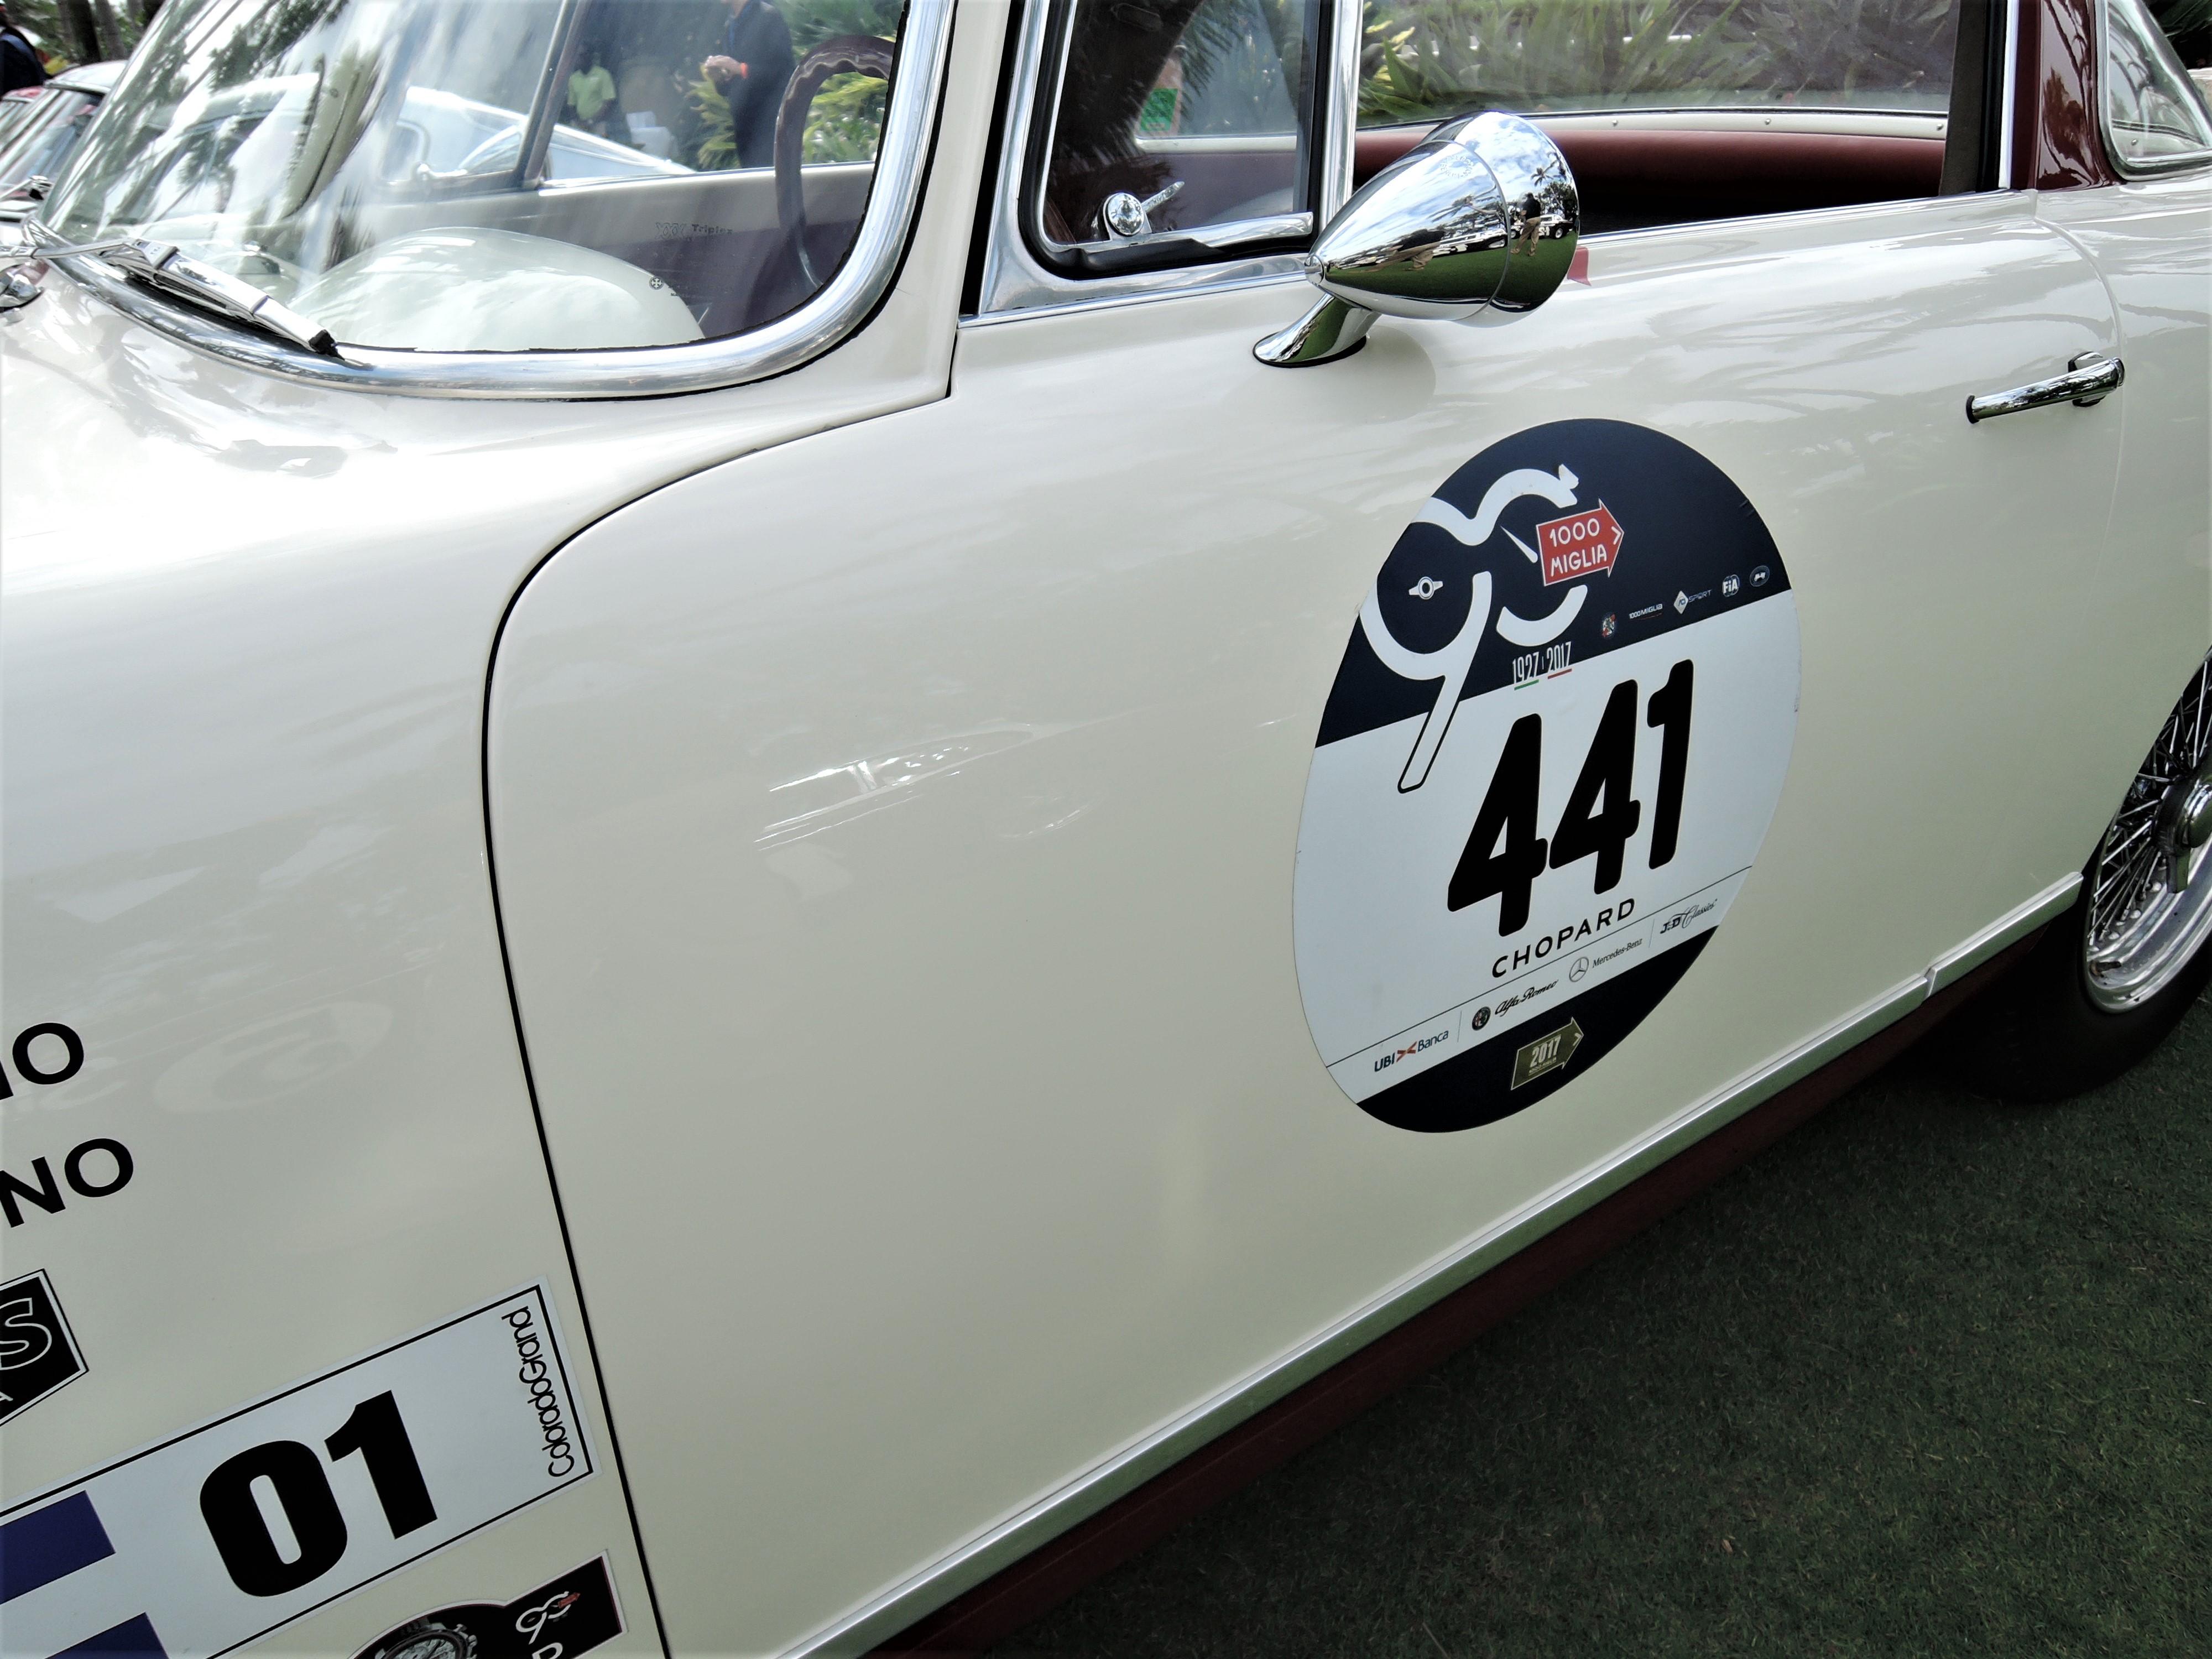 1956 250 GT Coupé Boano Alloy, s/n 0609 GT, - Cavallino 2018 Concours